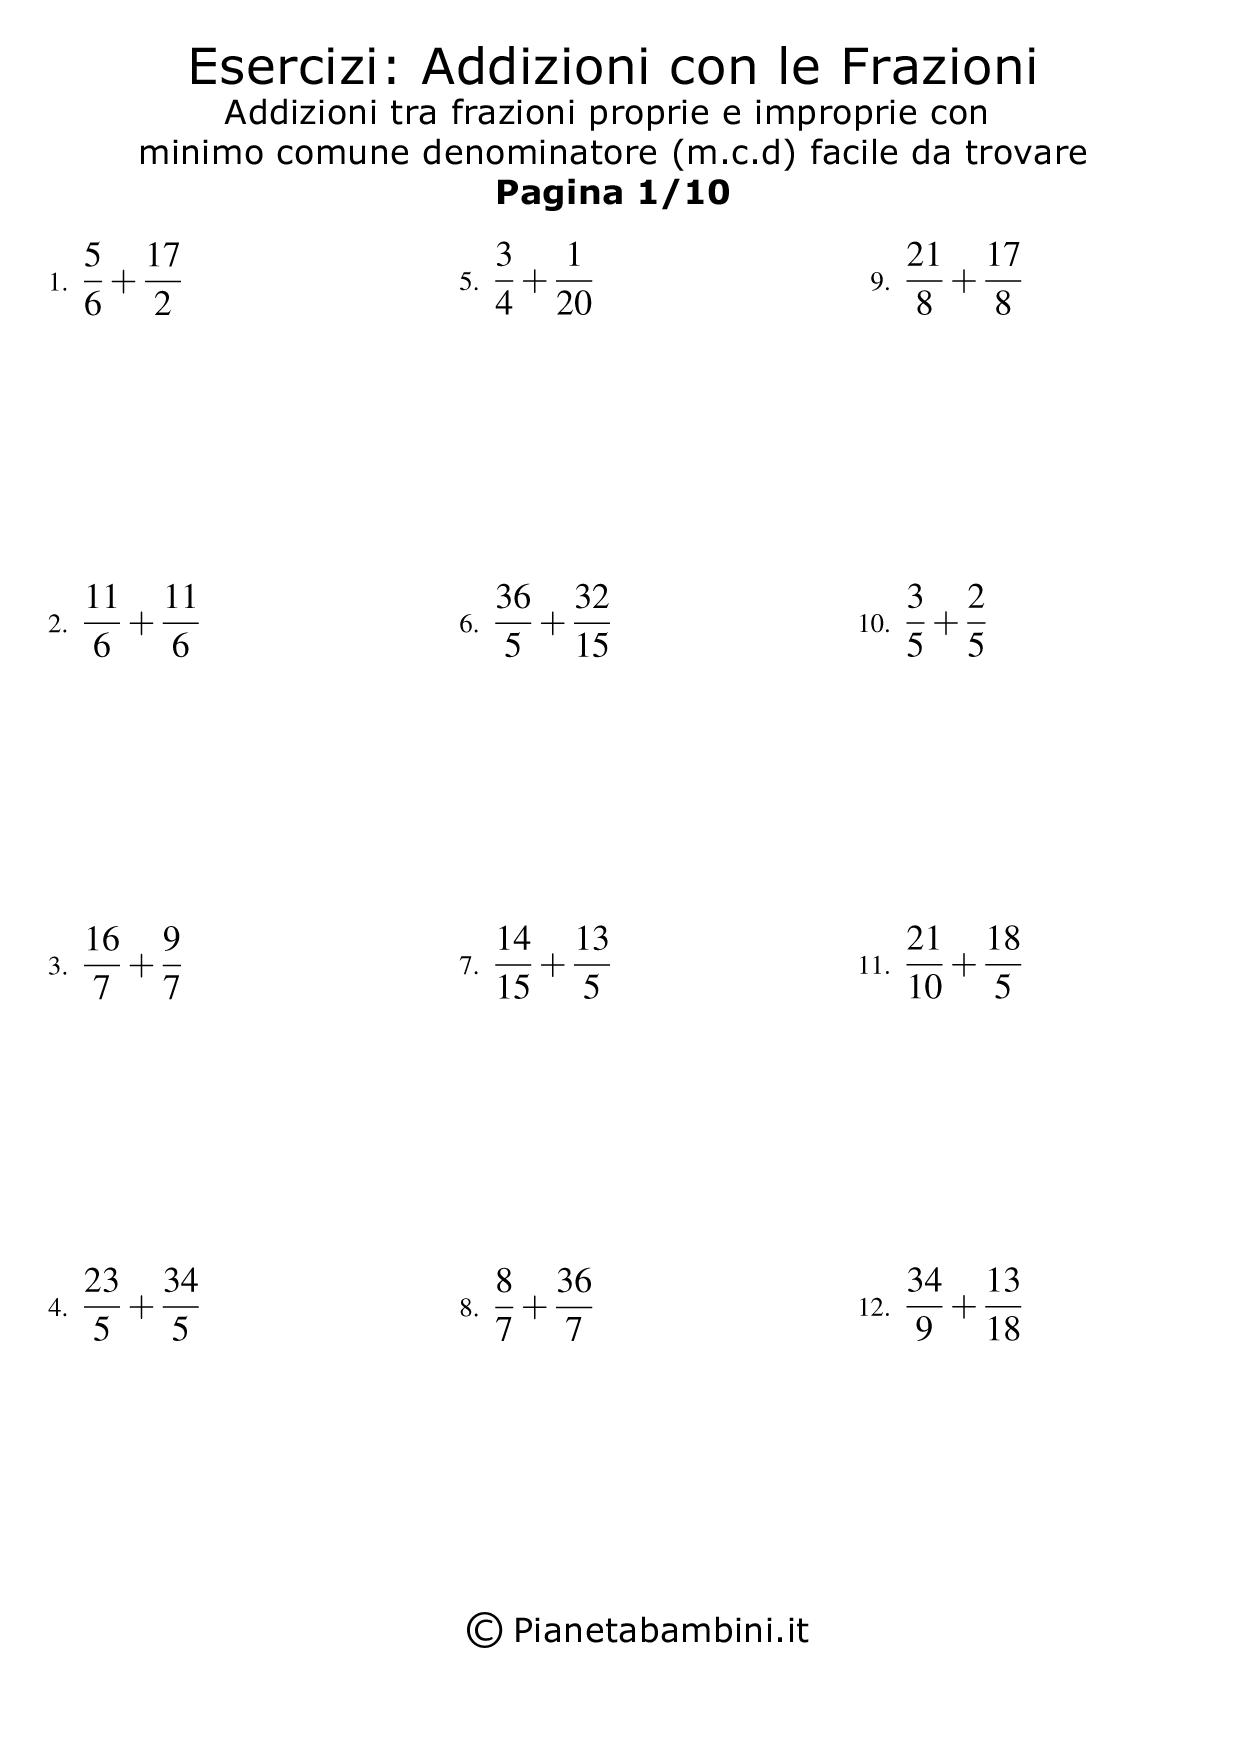 Frazioni-Proprie-Improprie-m.c.d-Facile_01